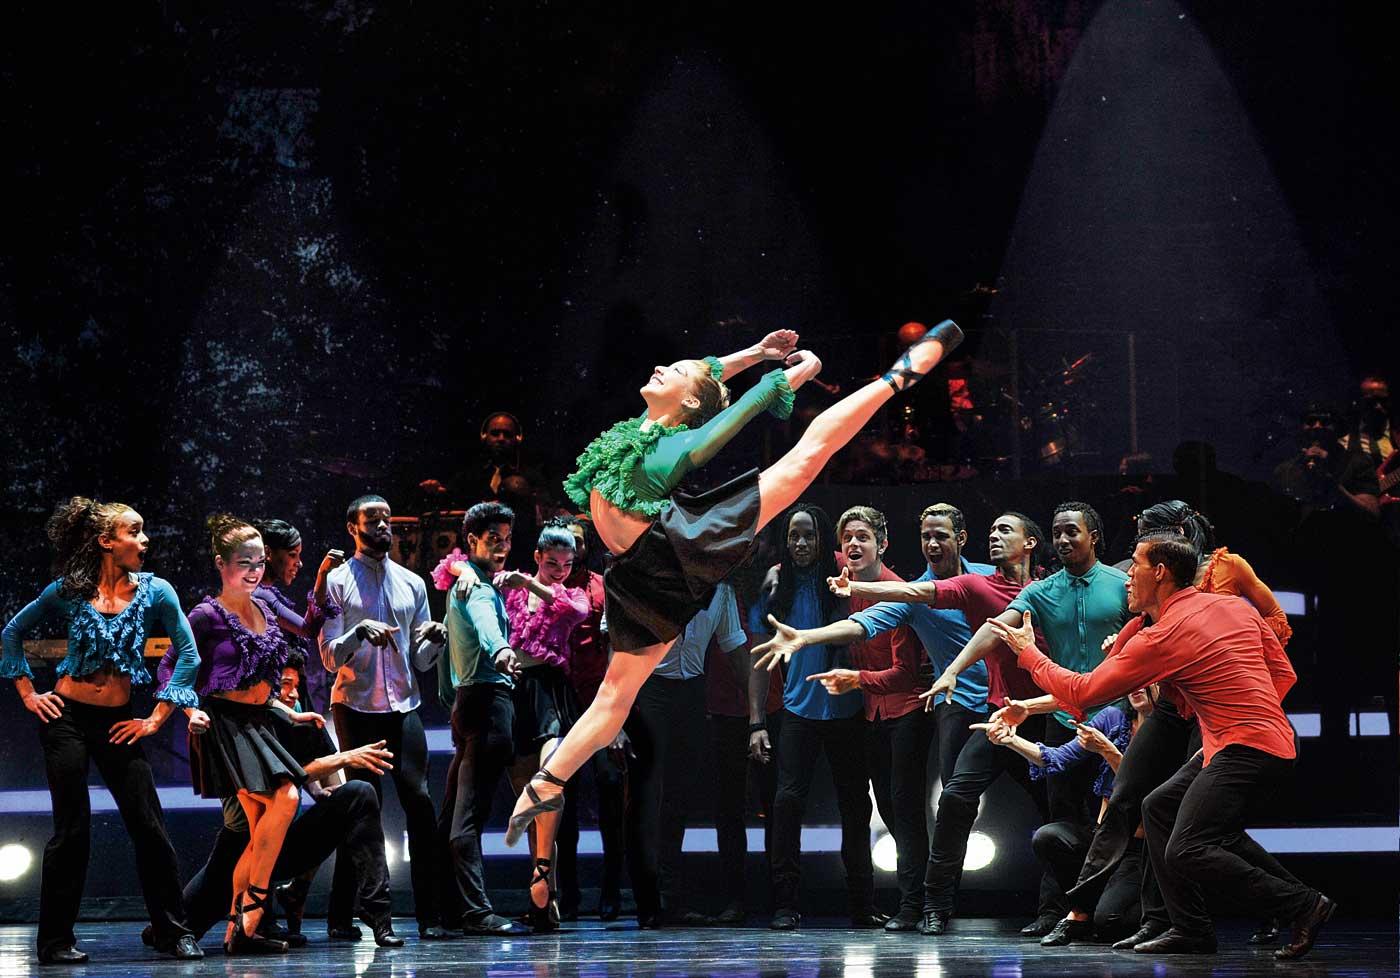 ballet-revolucion-foto-05-credit-nilz-boehme